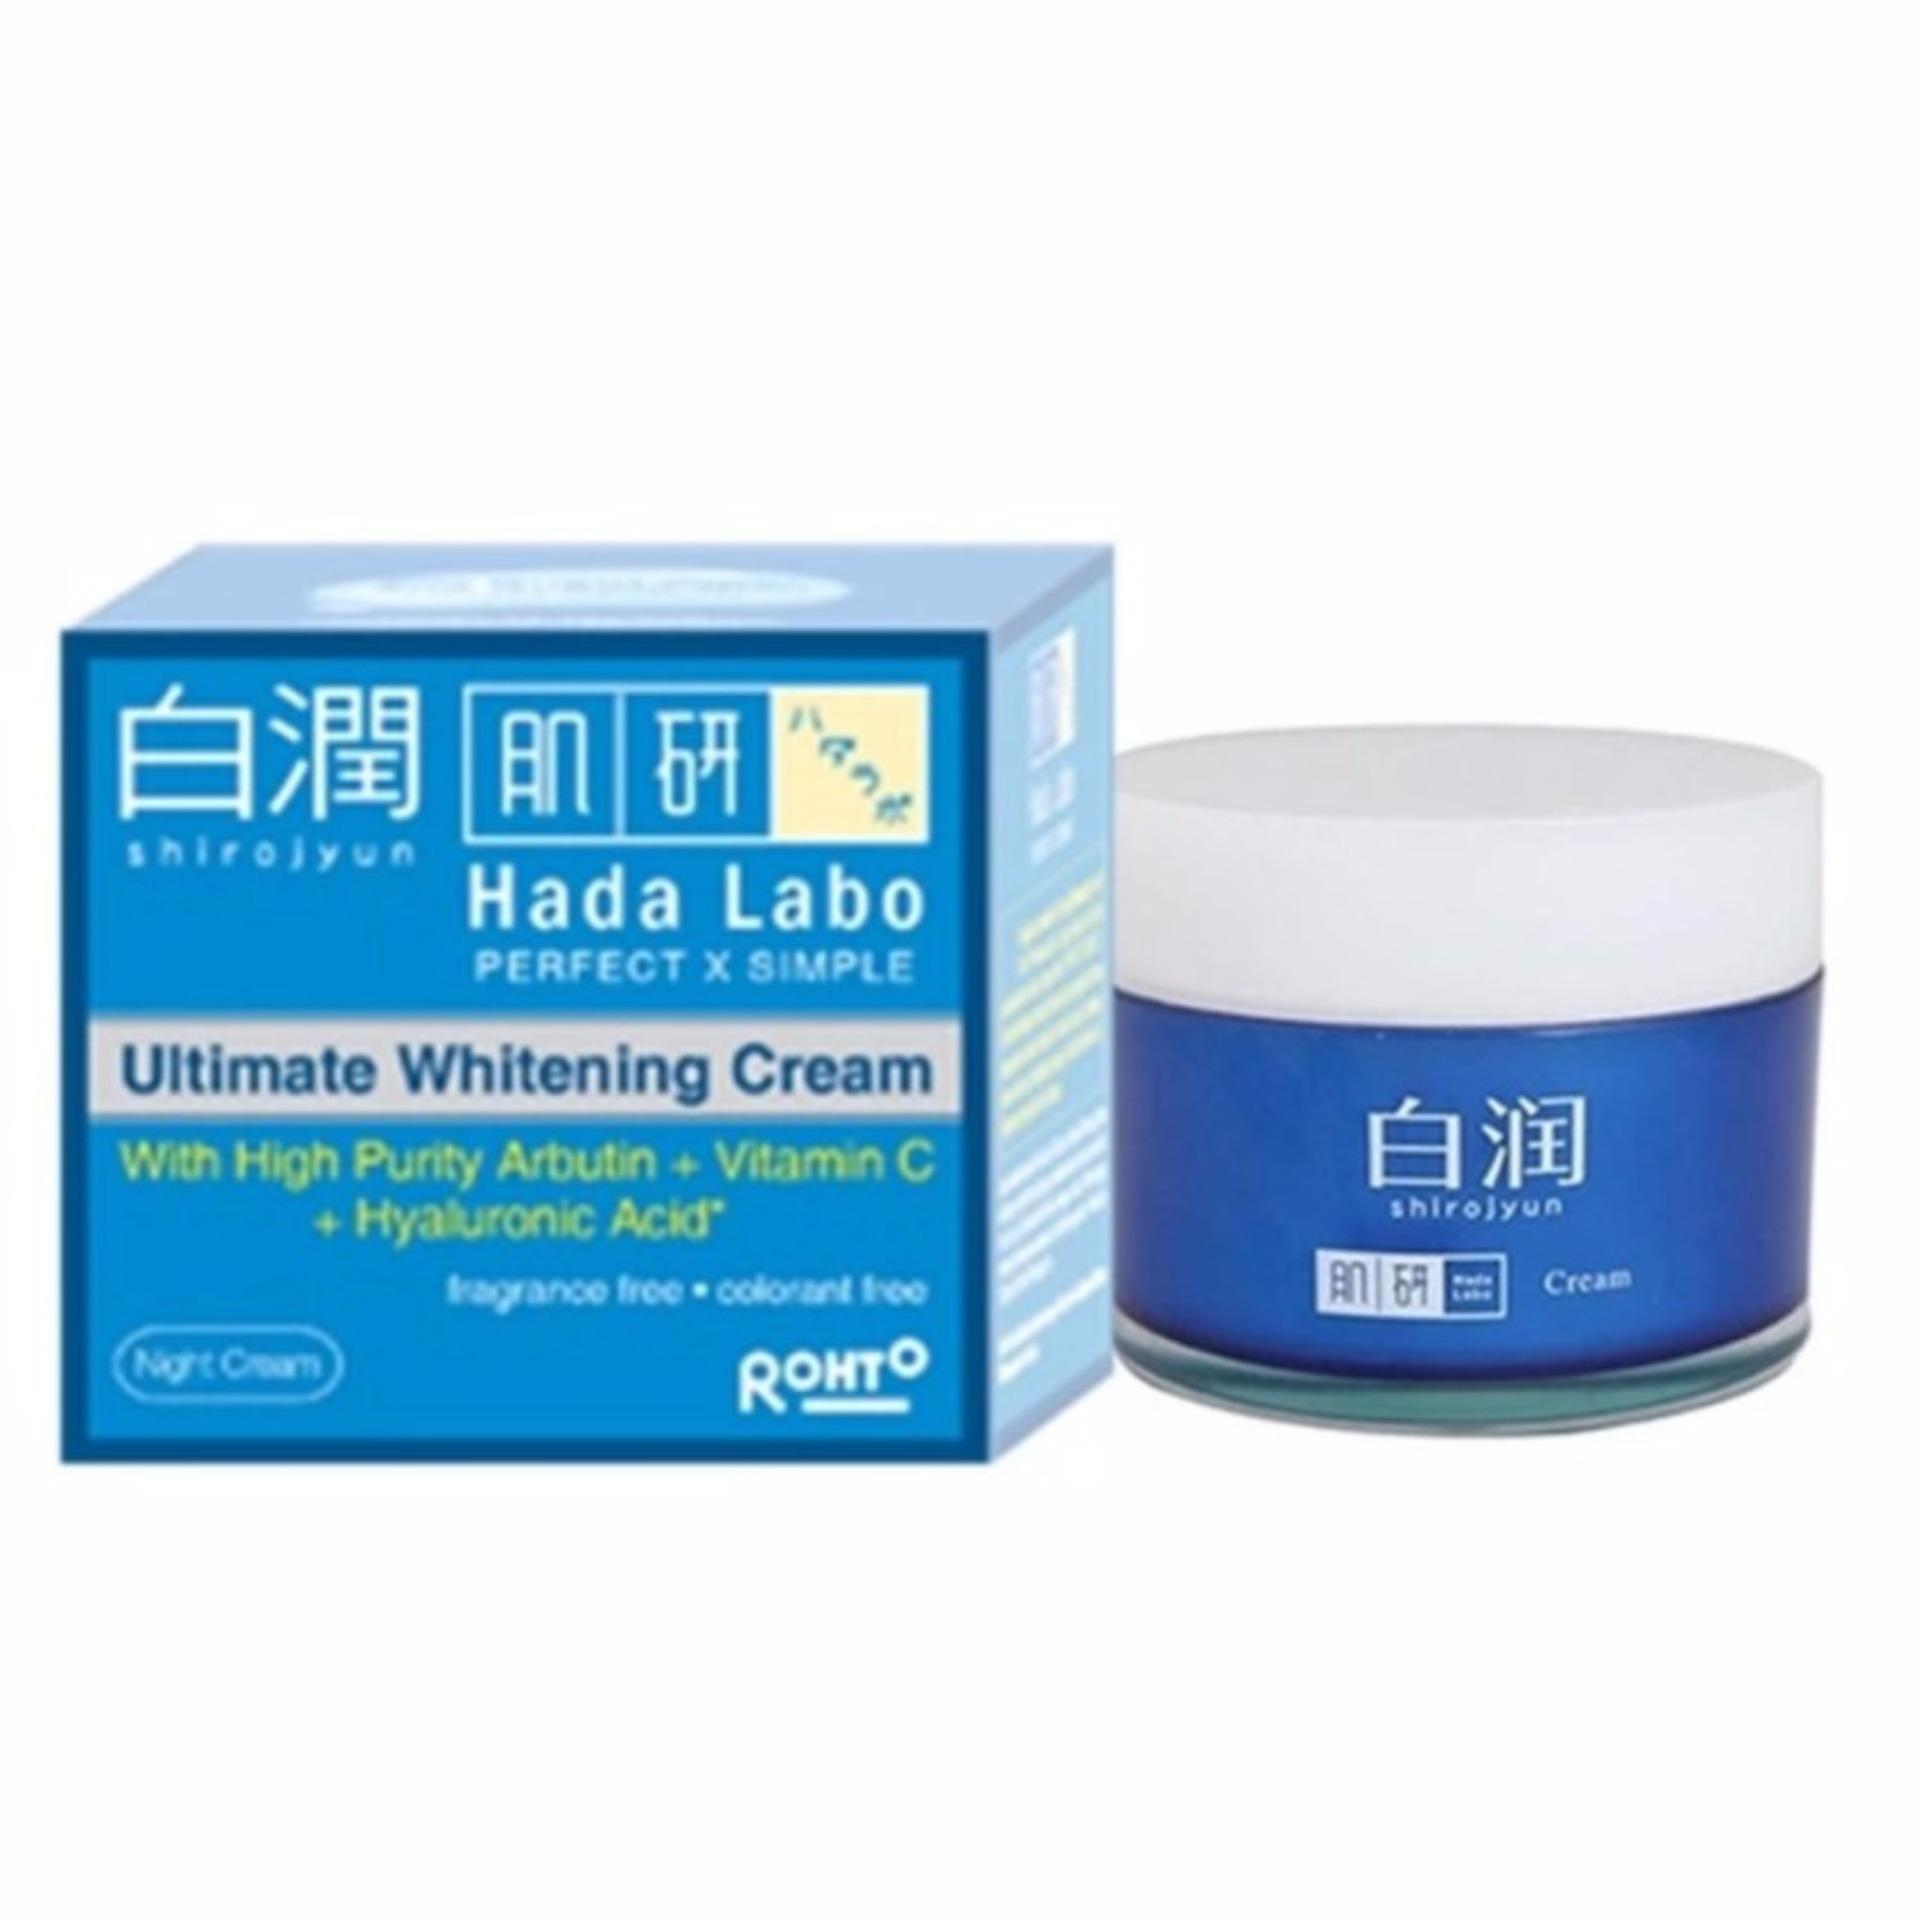 Jual Krim Malam Terbaik Termurah Cordysep Night Cream Herbal Hada Labo Shirojyun Ultimate Whitening 40g